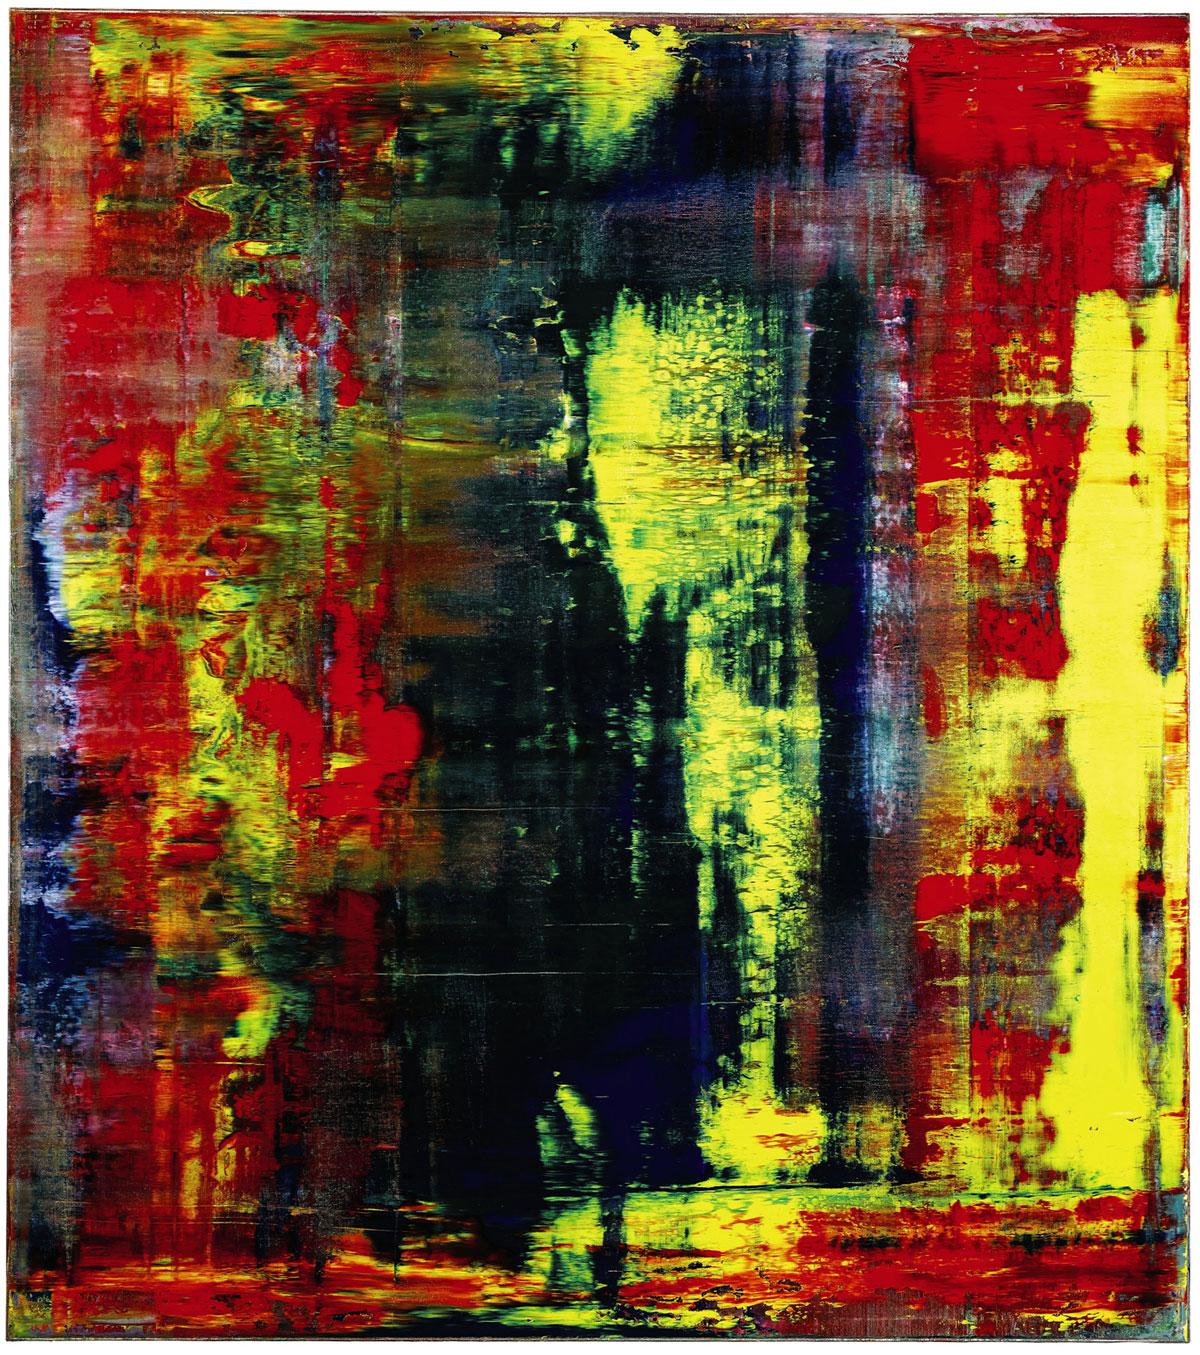 Gerhard Richter Abstraktes Bild (809-4)